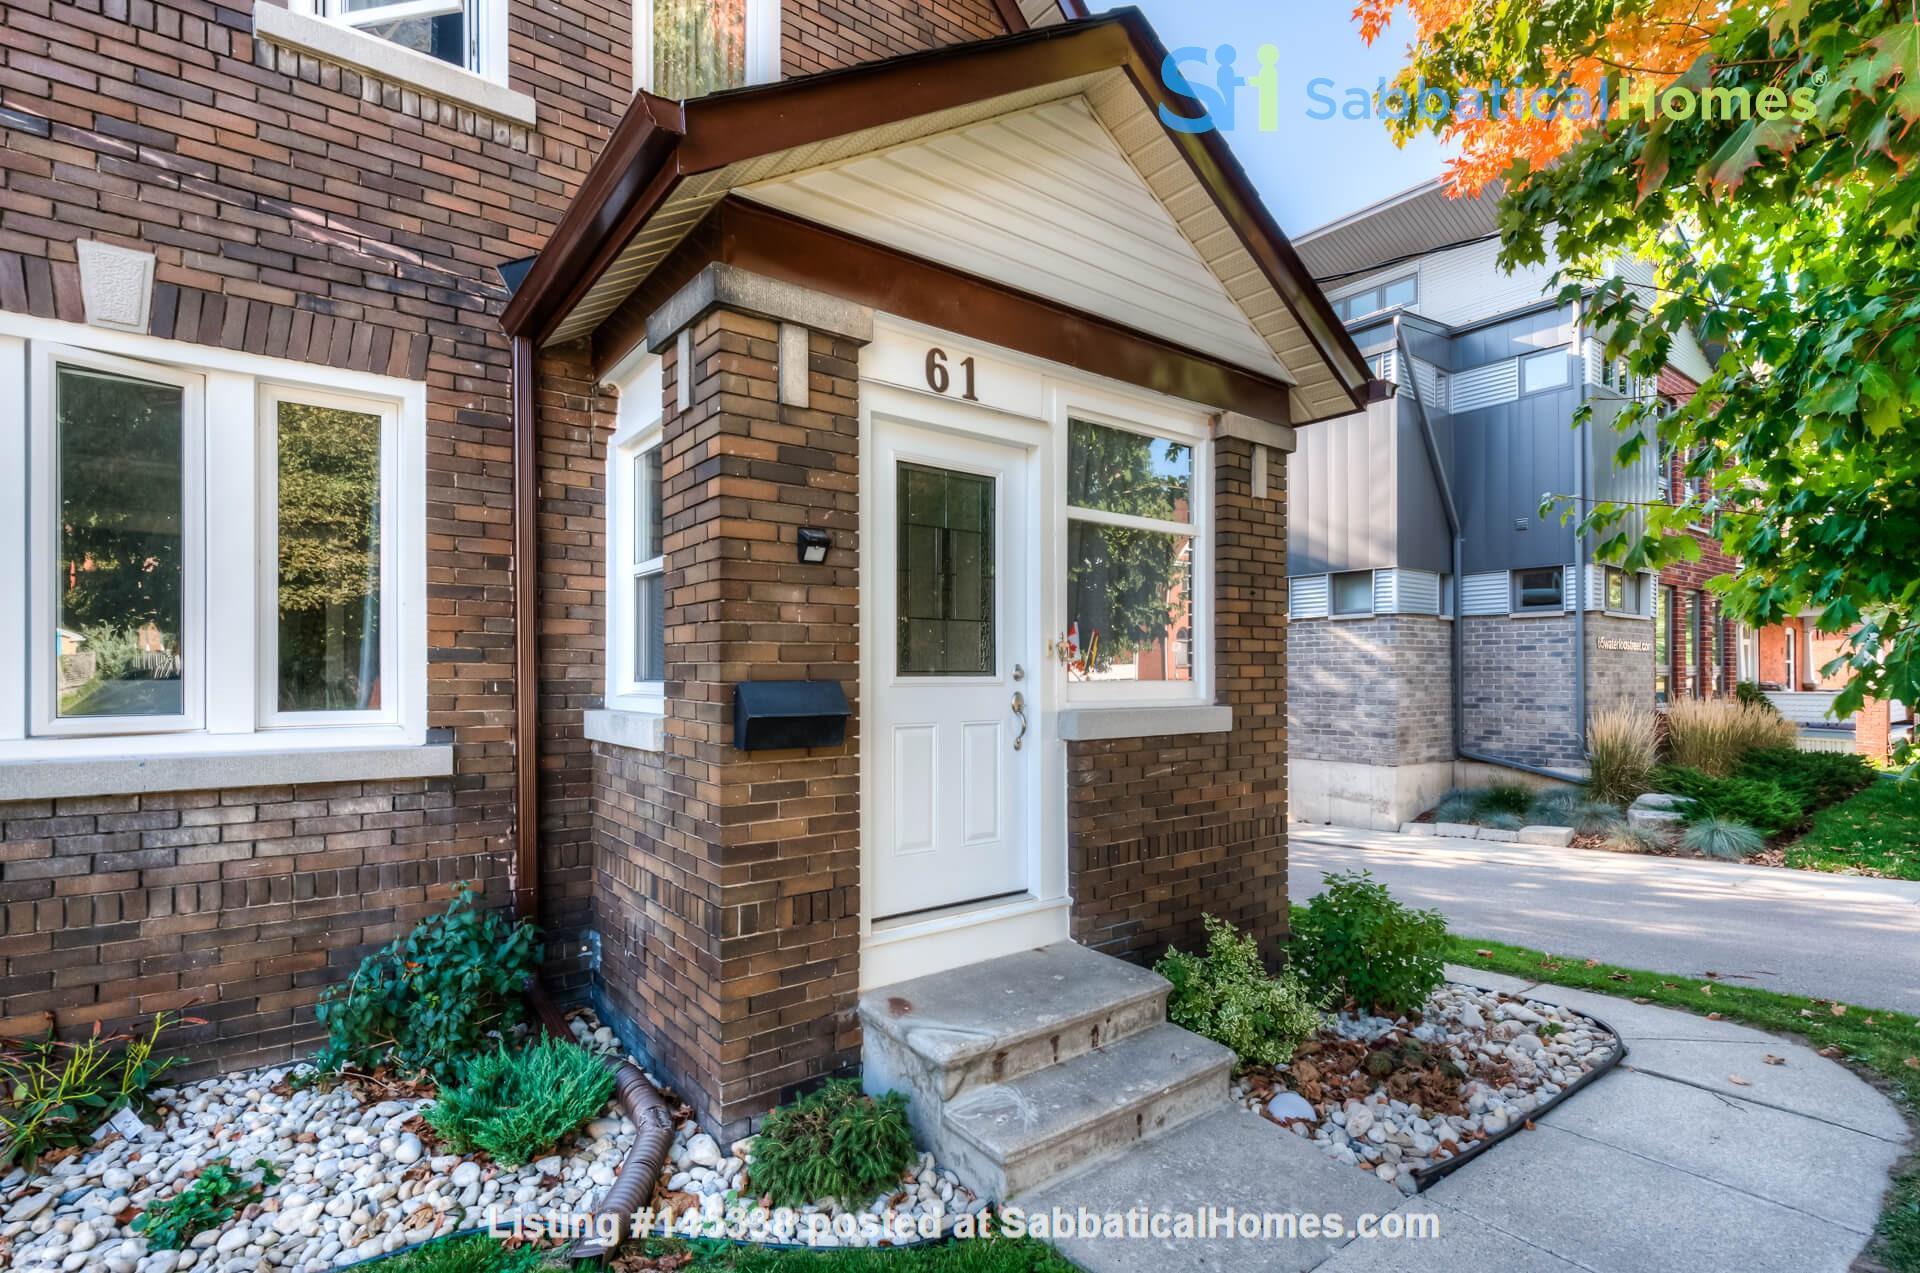 3 bdrm home (unfurnished) - downtown Kitchener-Waterloo Home Rental in Kitchener, Ontario, Canada 0